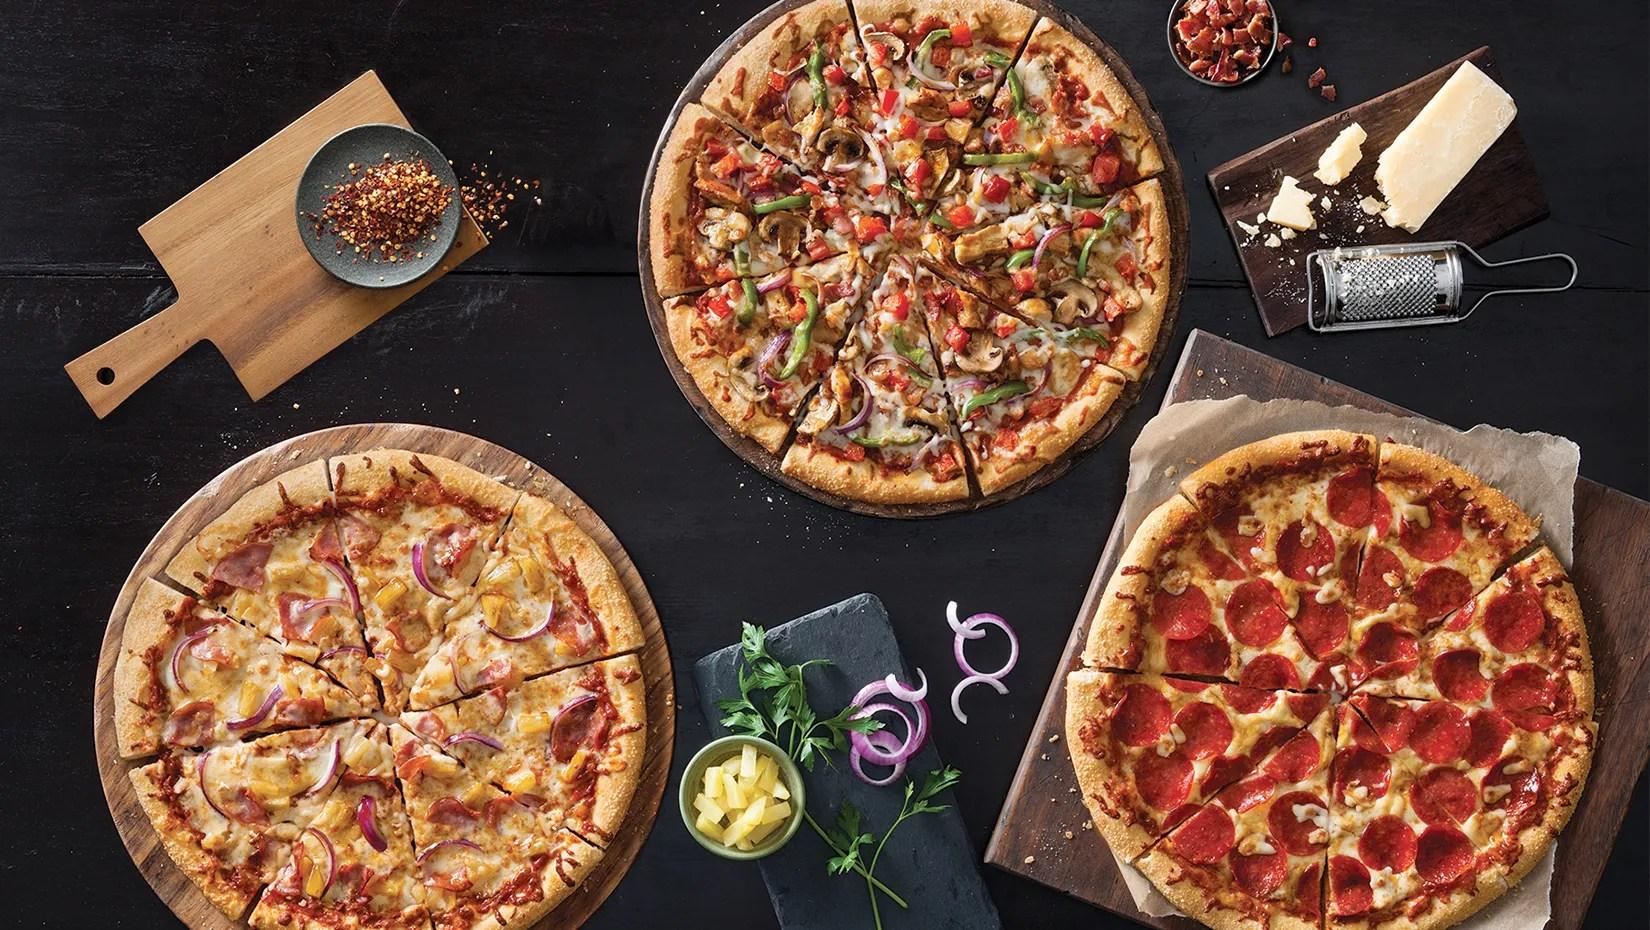 Pizza Hut Tests Quot Skinny Slice Quot Pizza